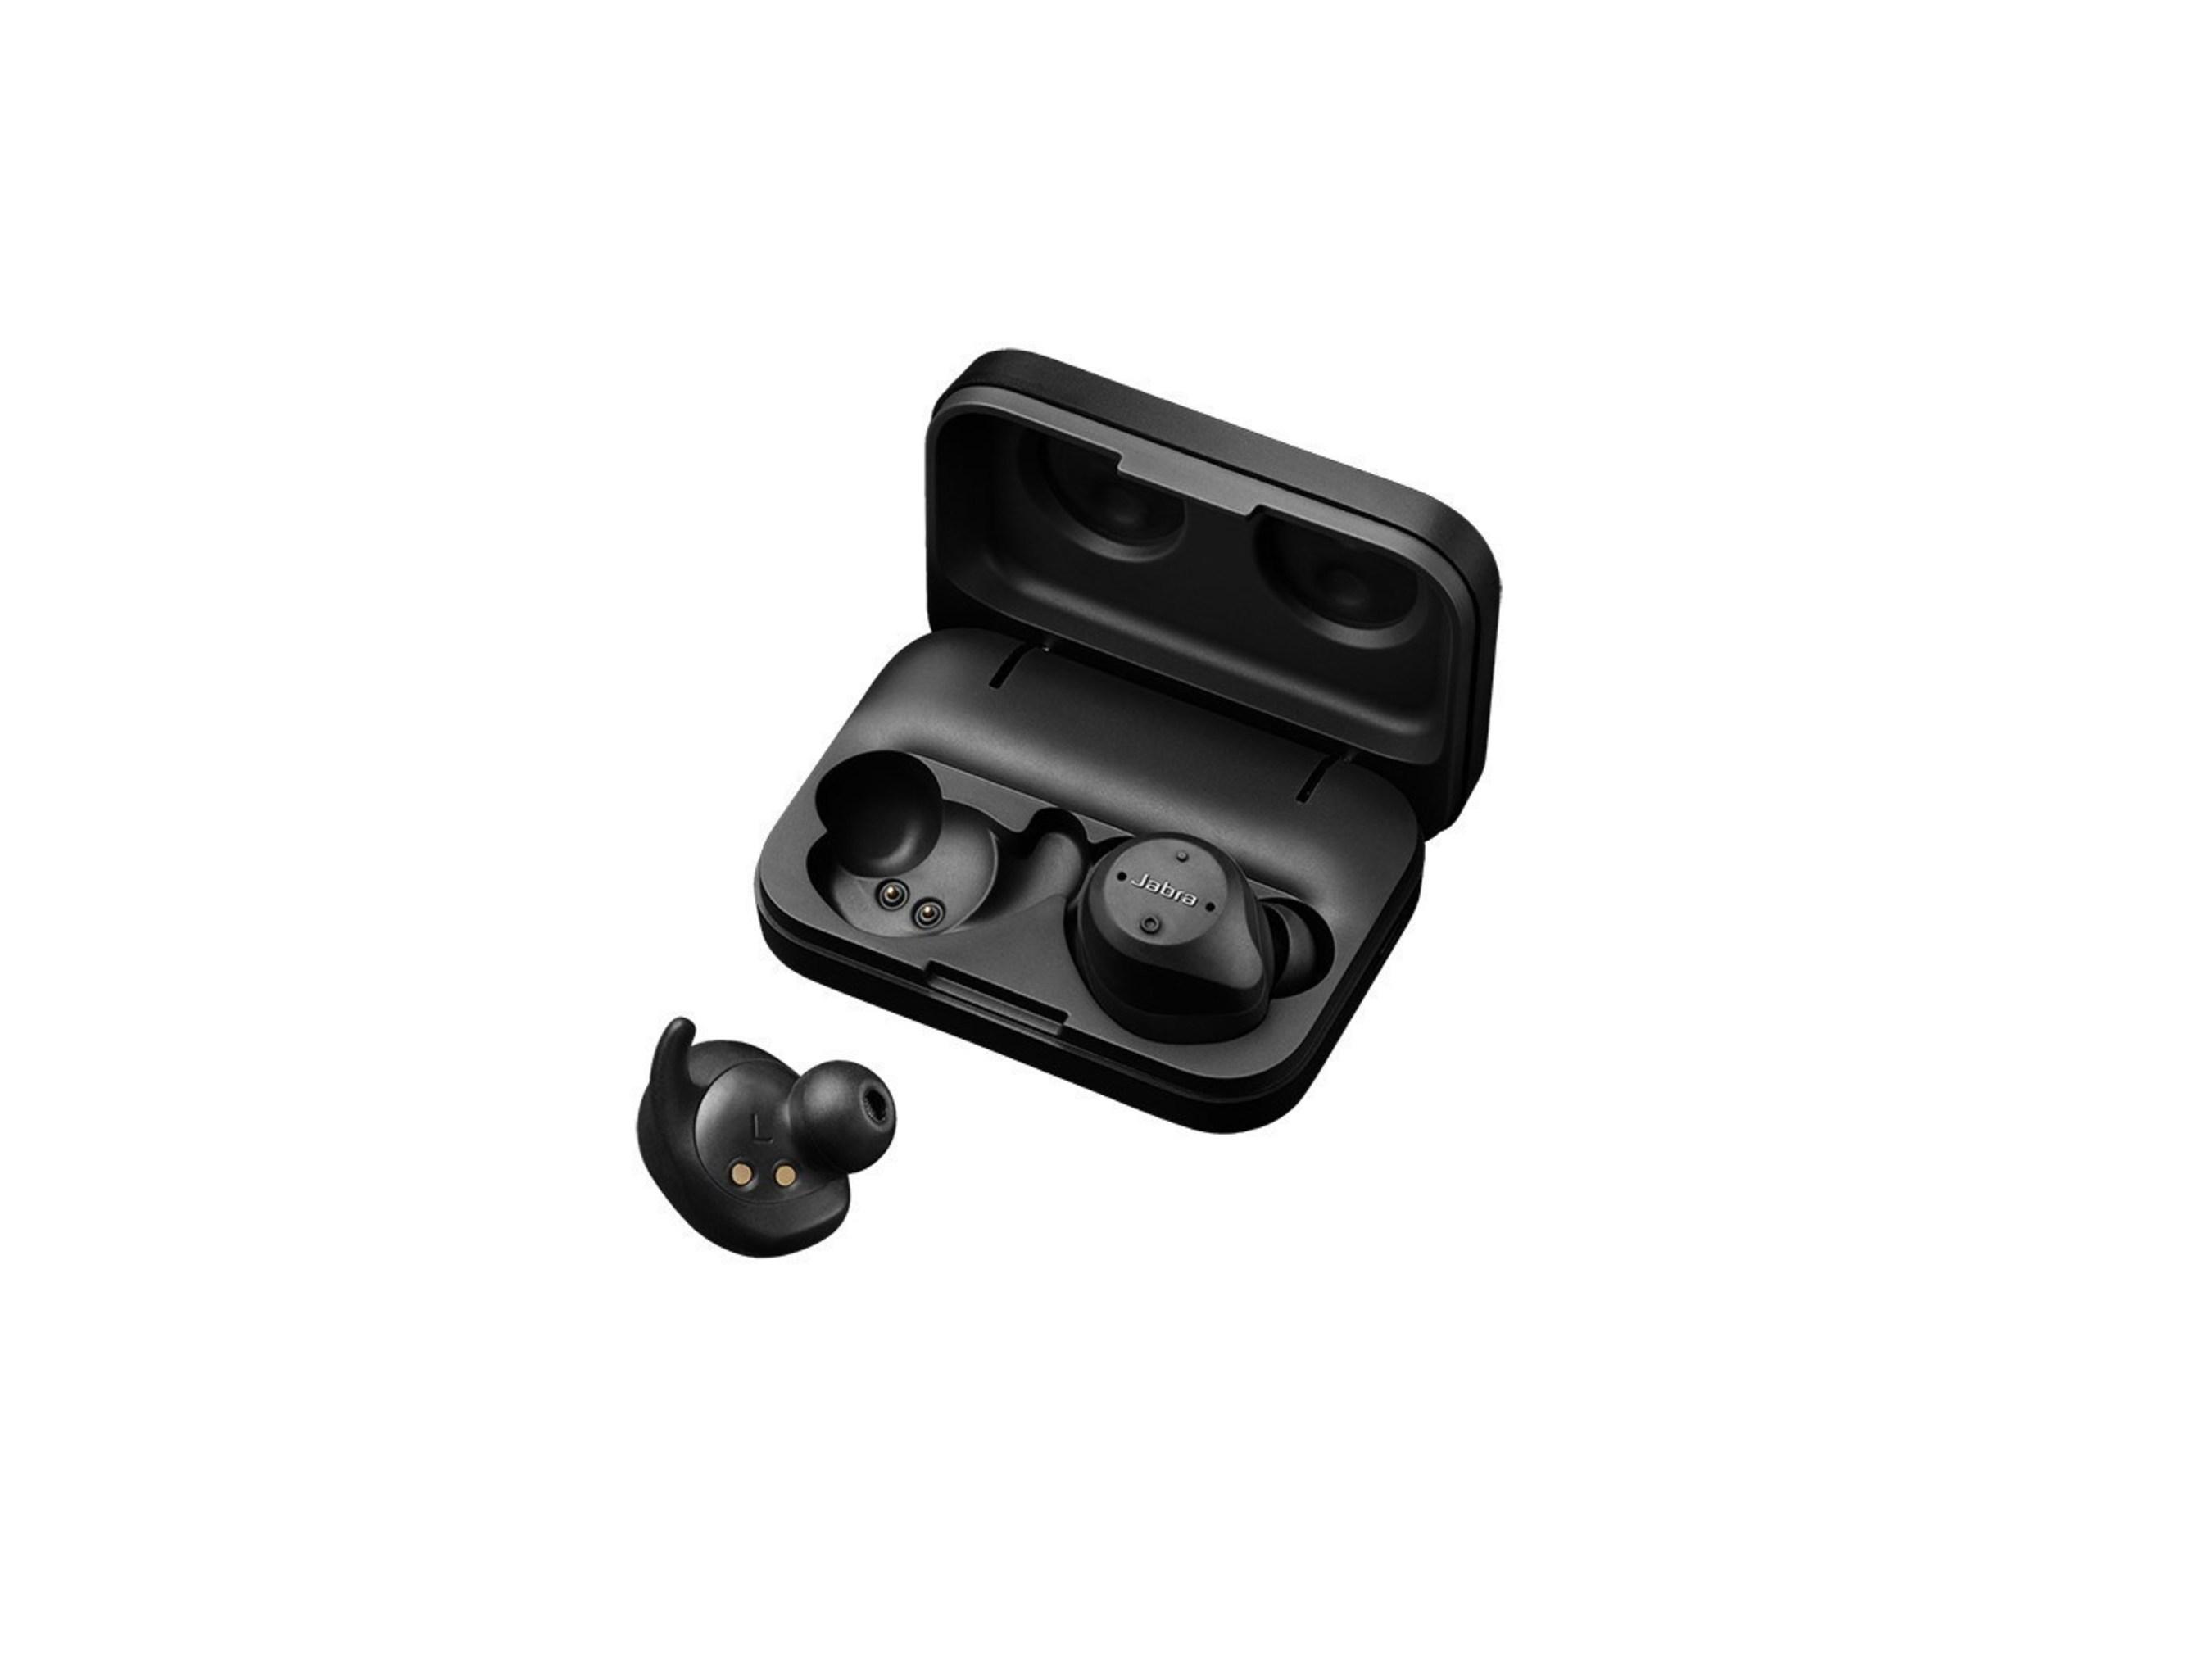 Jabra unveils the most technically advanced true wireless sports earbuds